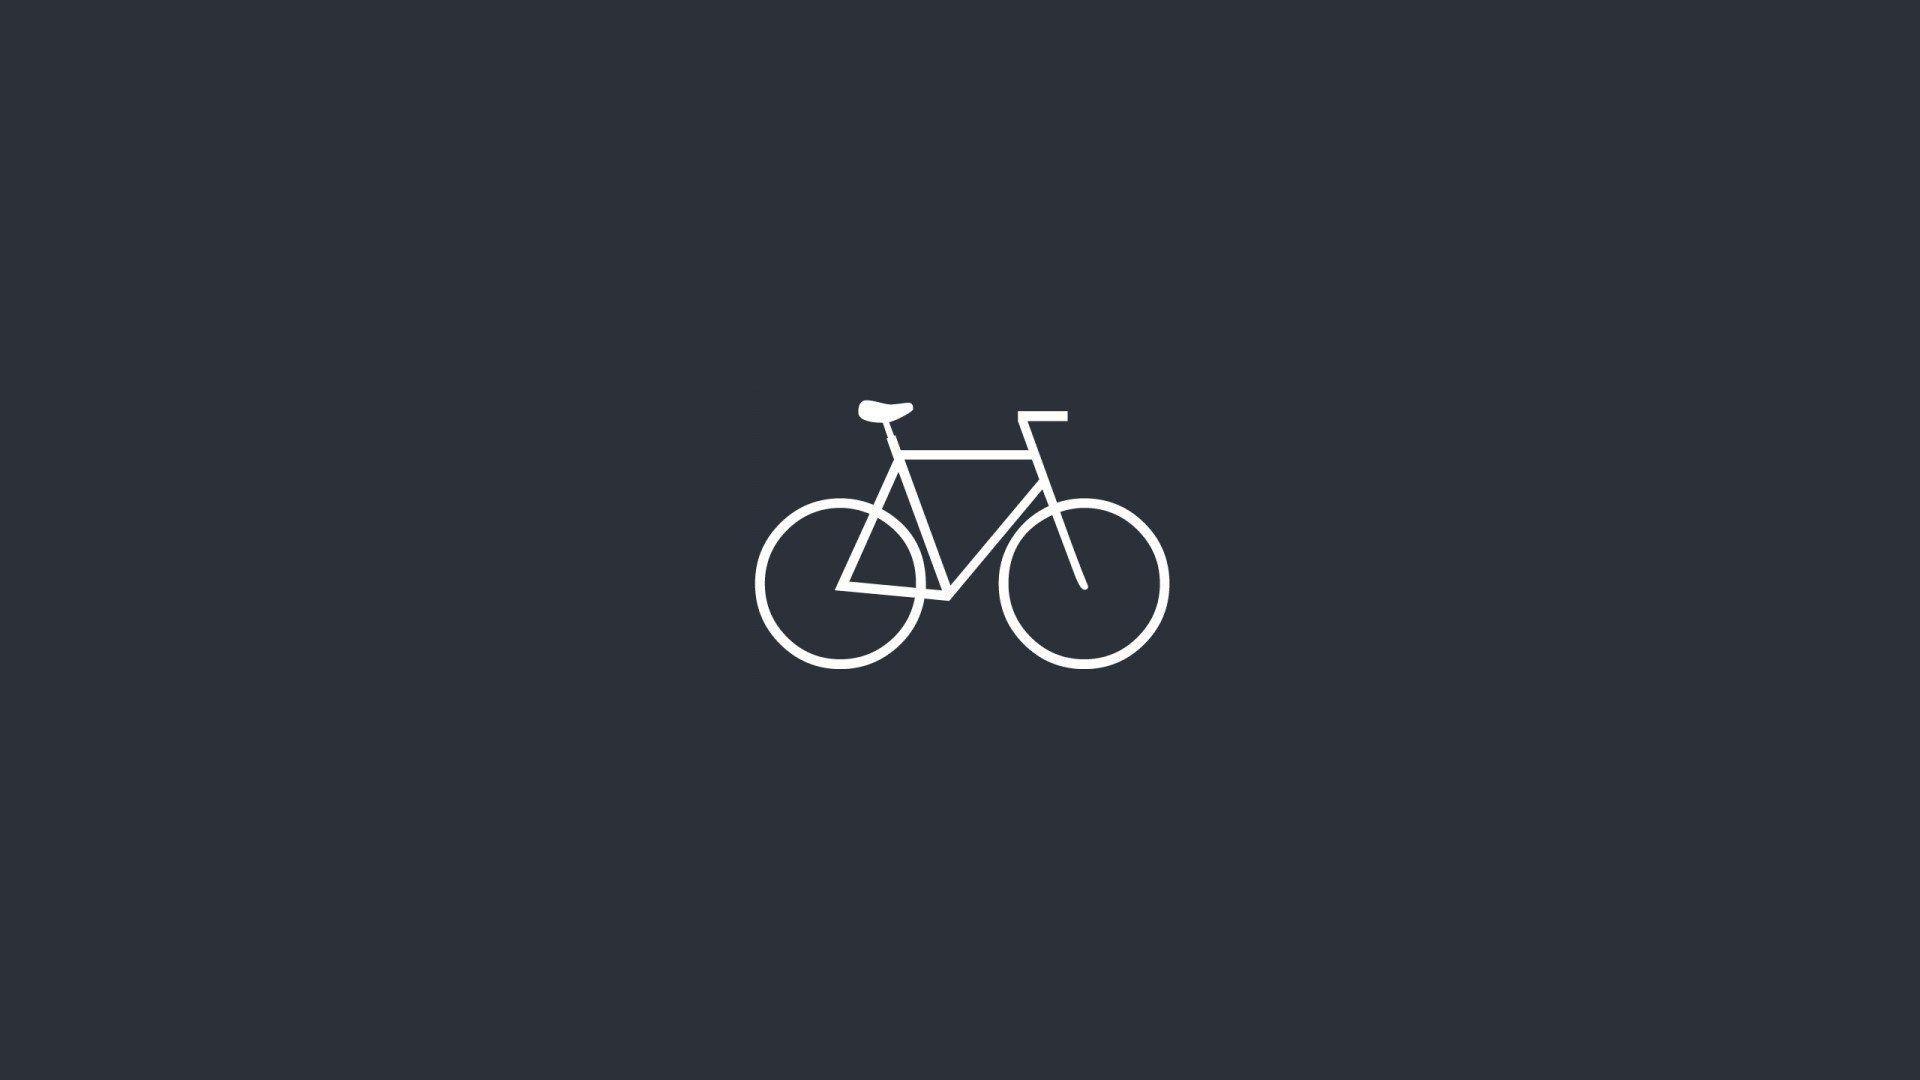 Bicycle Minimalistic Art 7001910 Bicycle Wallpaper Desktop Wallpaper Bike Drawing